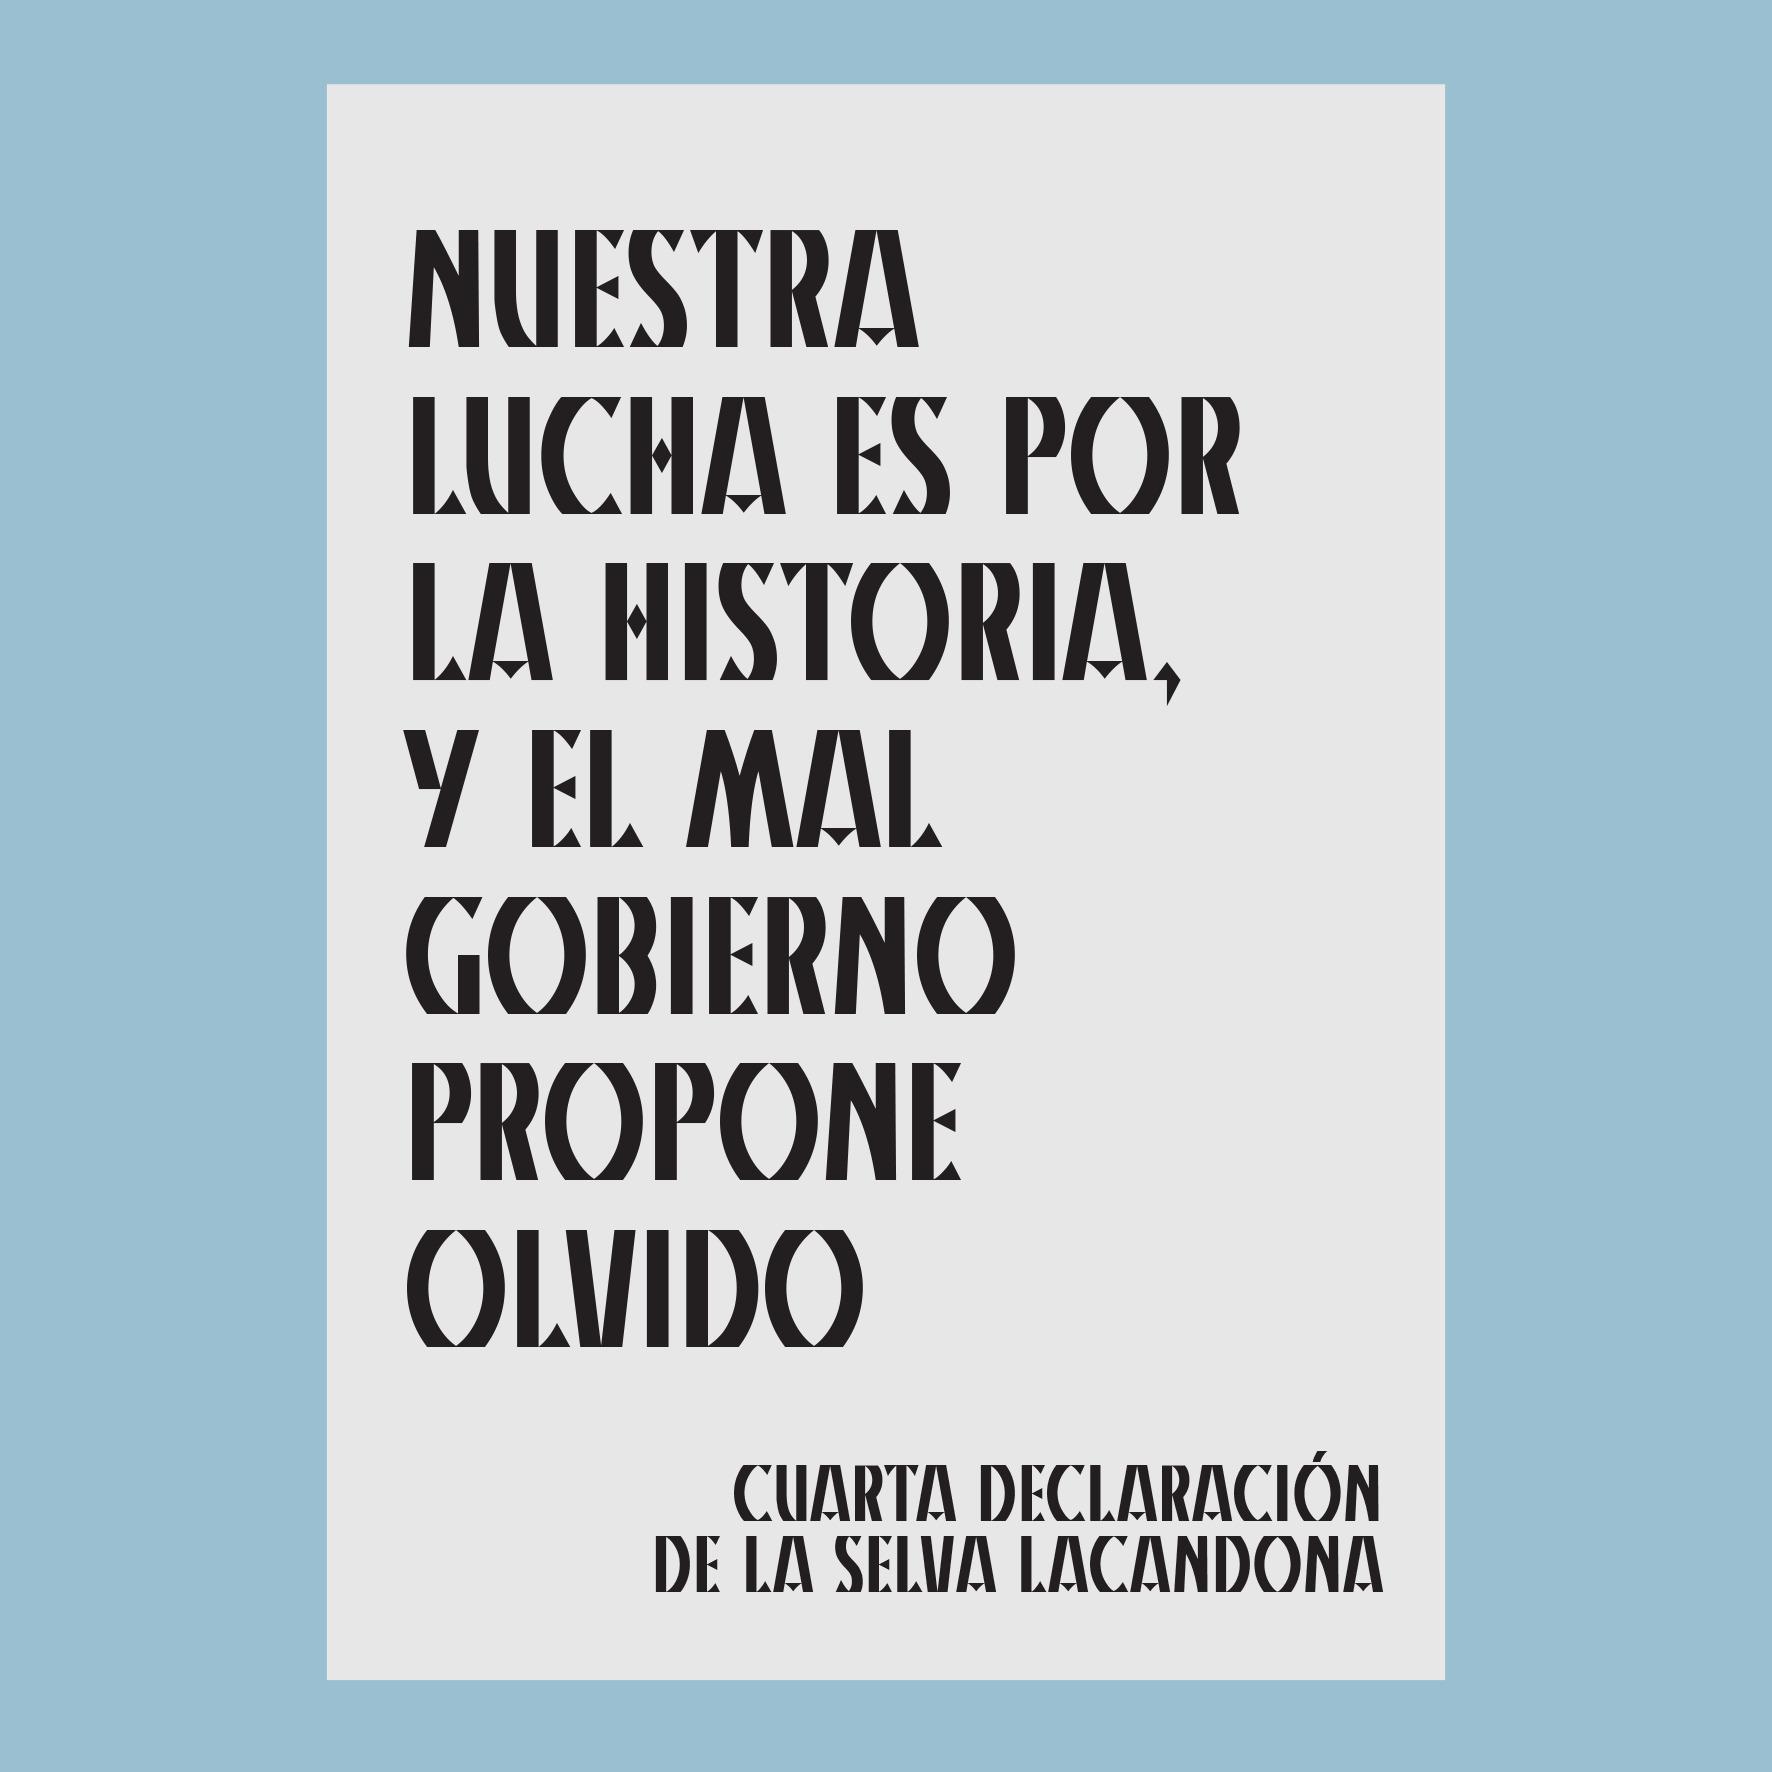 midia-azul-3- espanhol